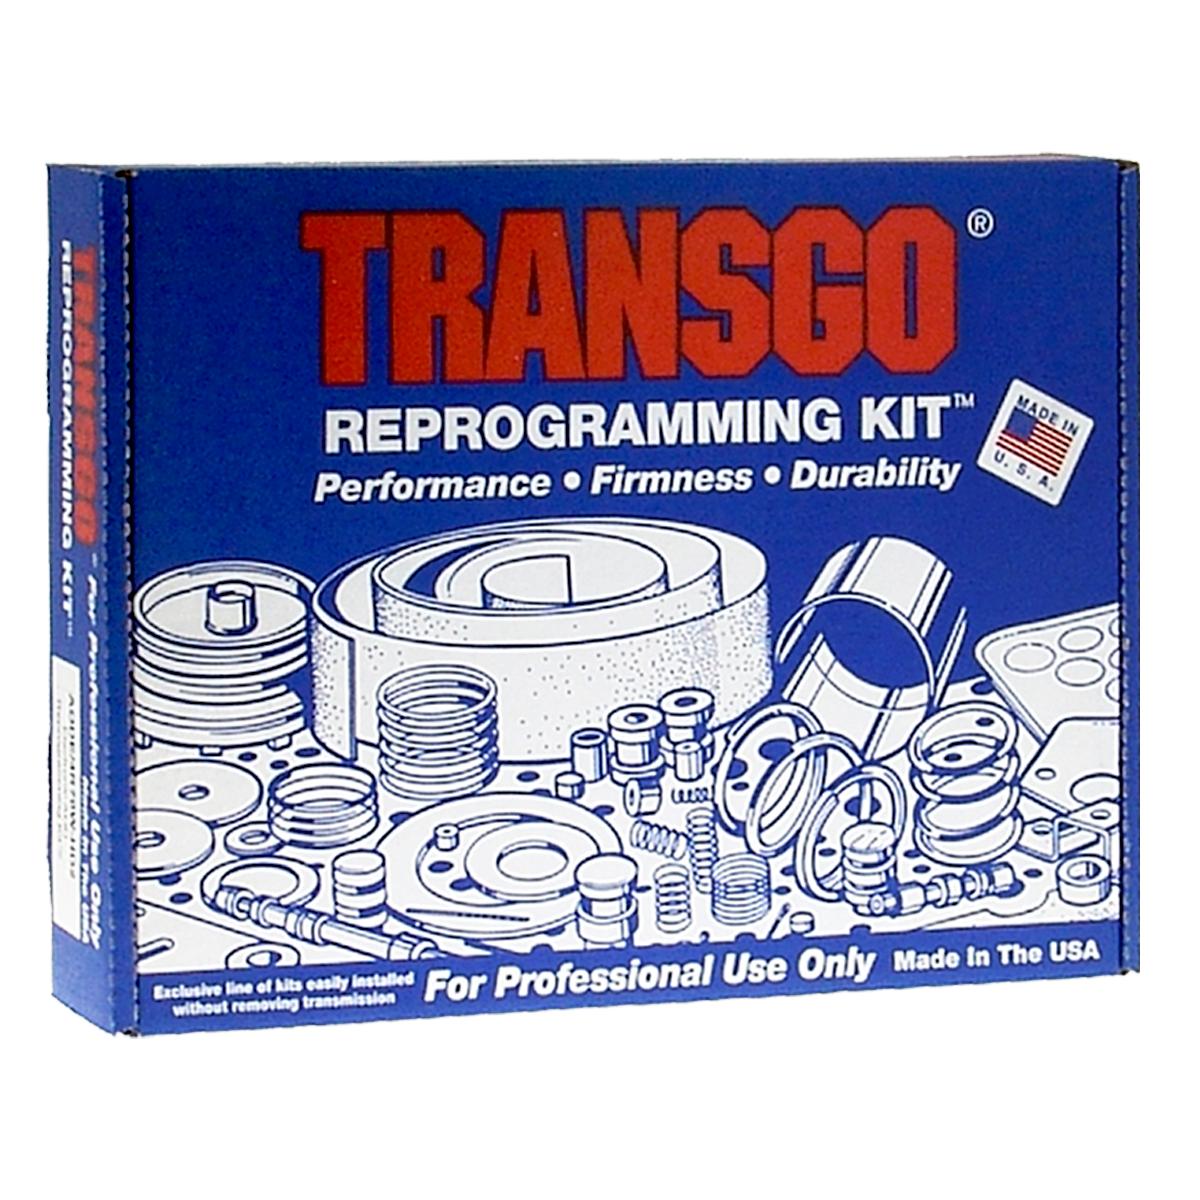 TransGo Reprogramming Kit